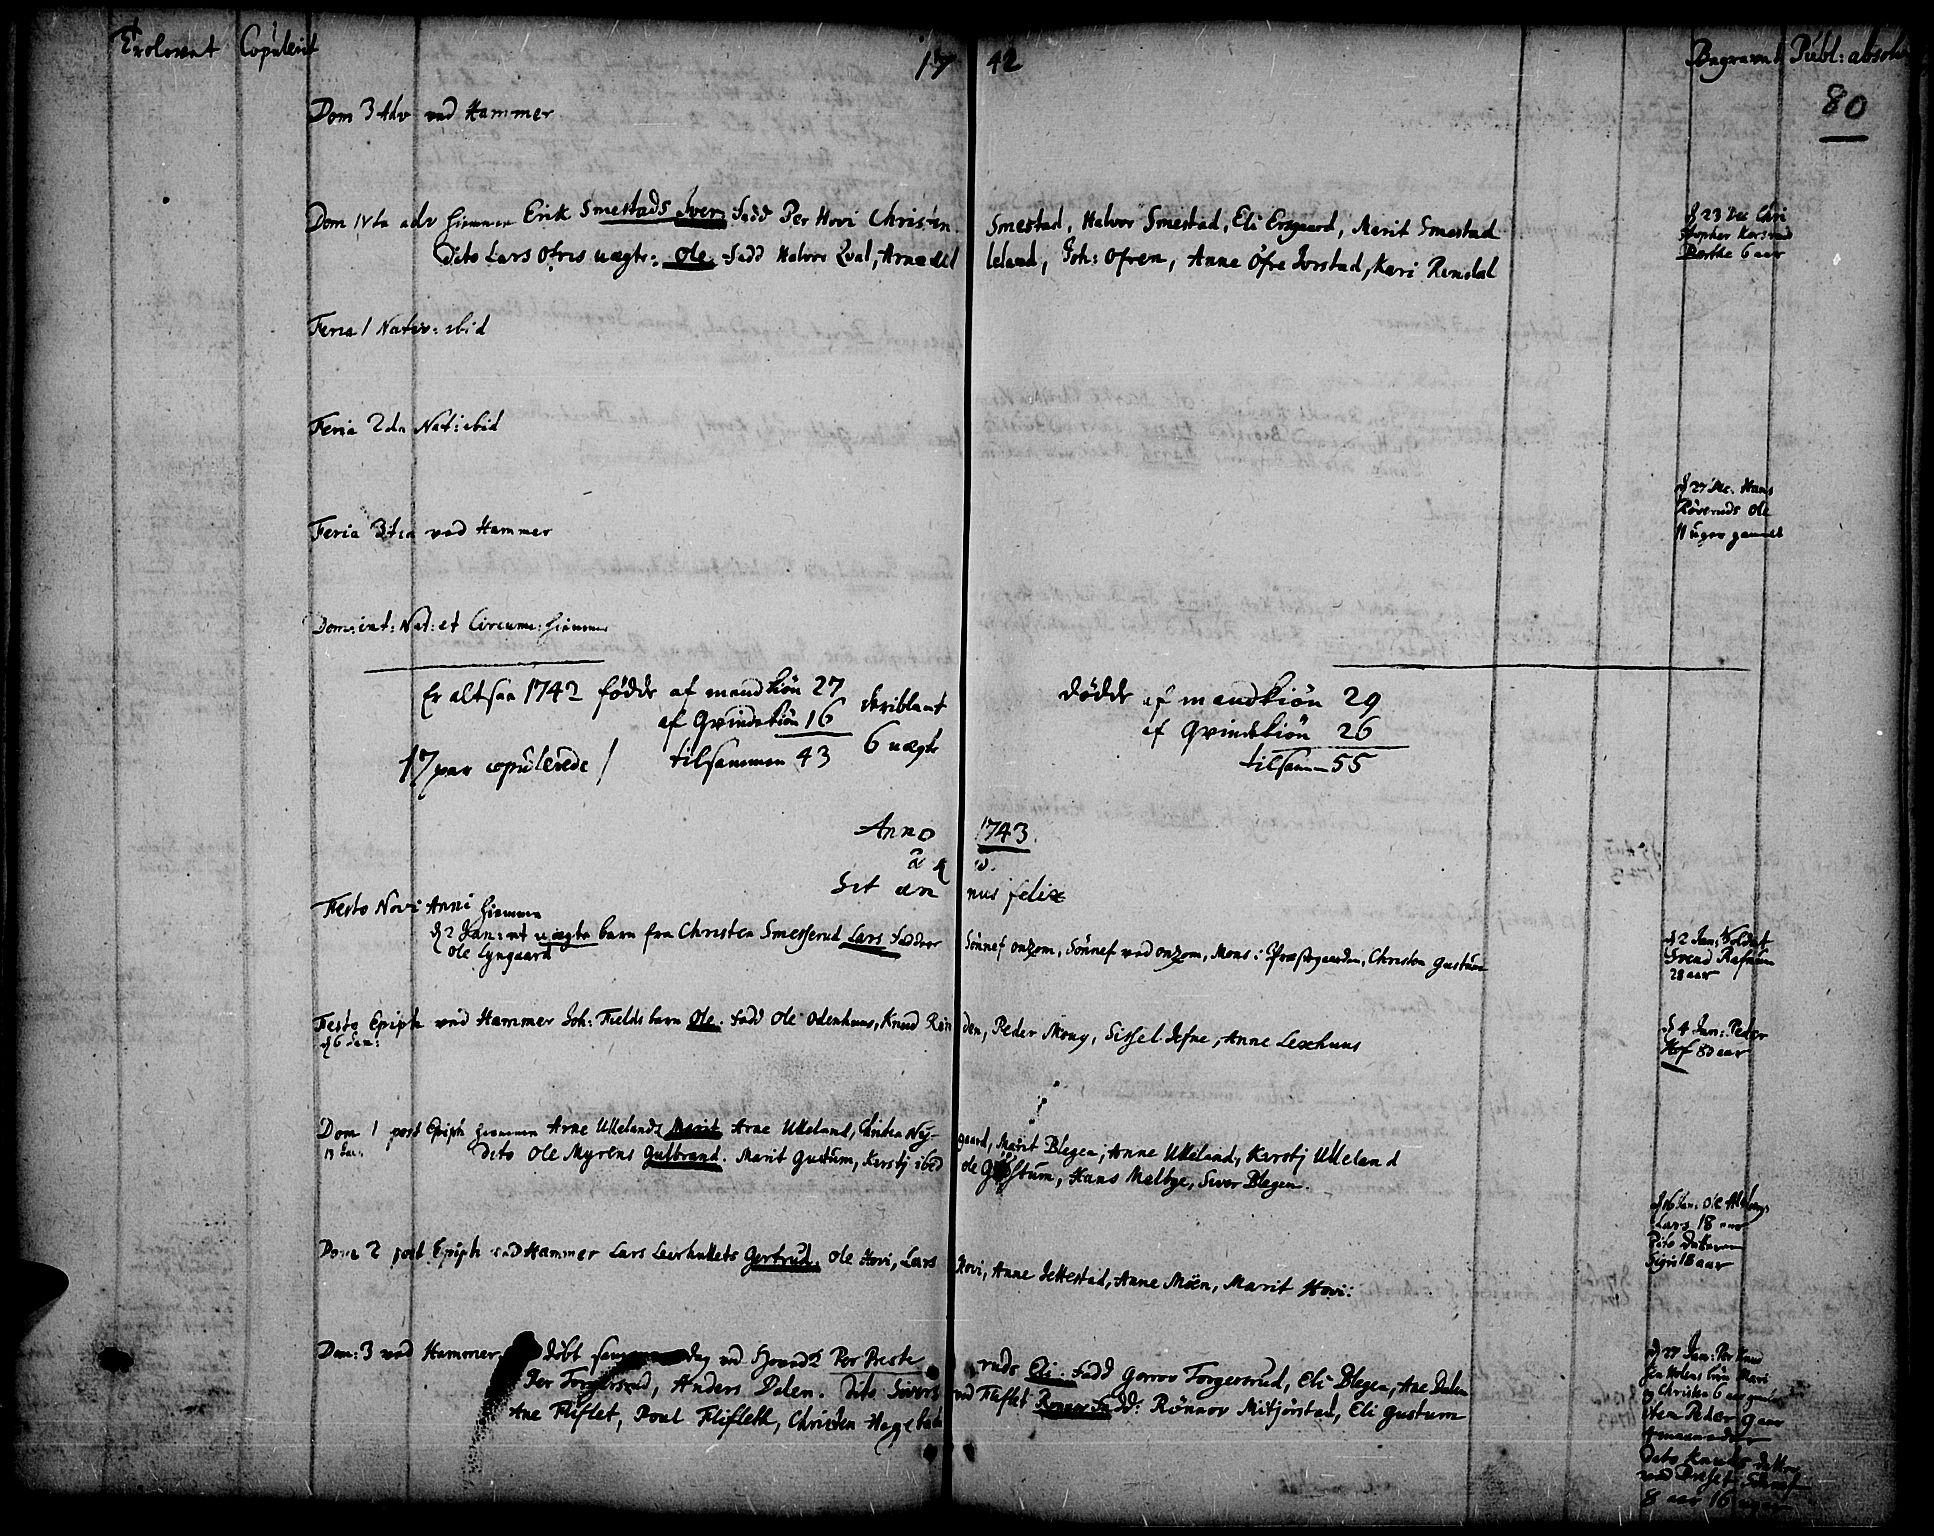 SAH, Fåberg prestekontor, Ministerialbok nr. 1, 1727-1775, s. 80